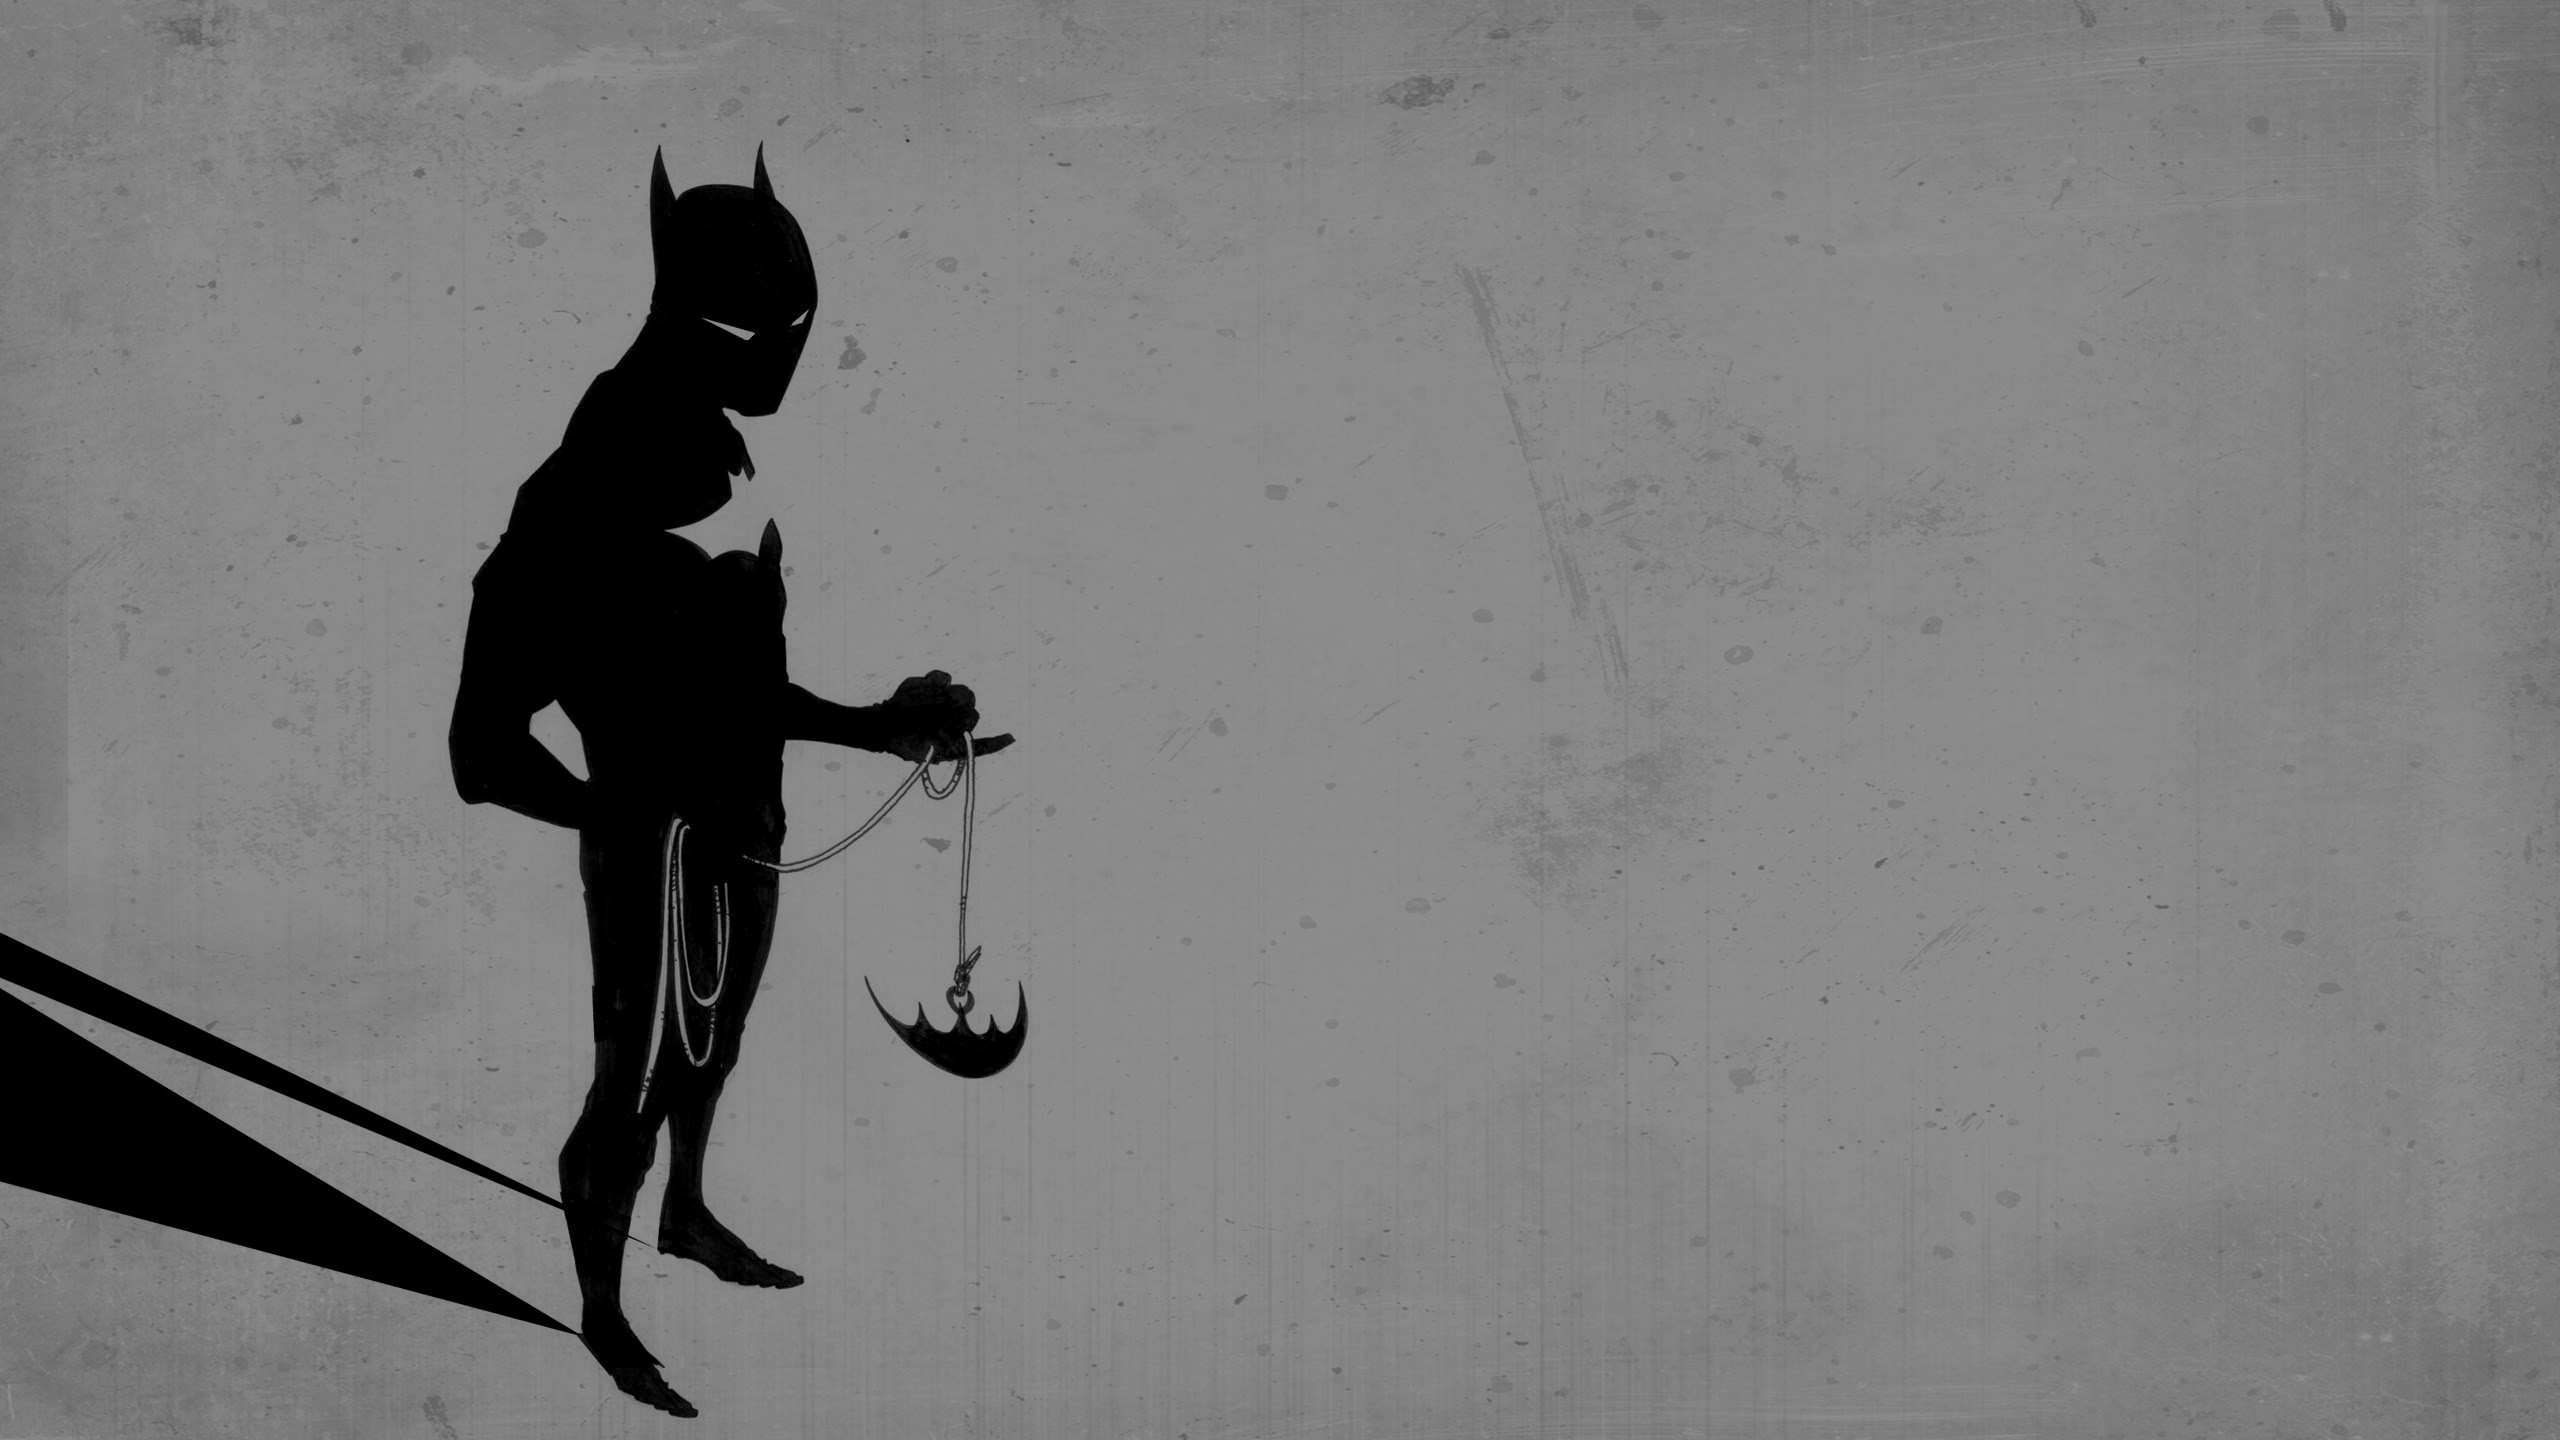 Batman Beyond Wallpaper High Quality Collection 2017